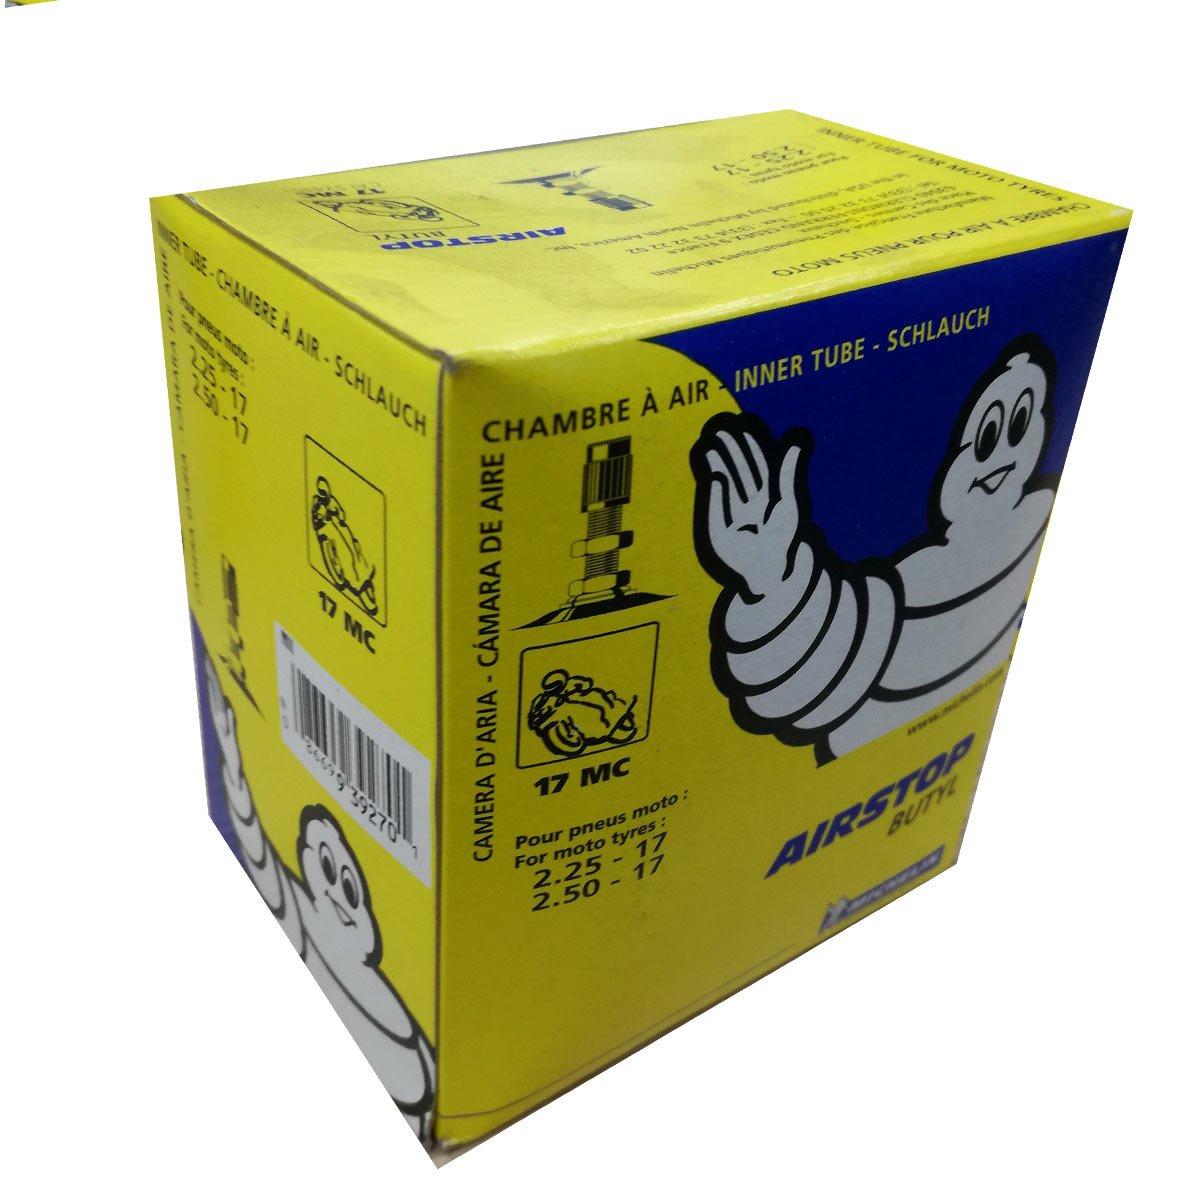 Camera aria moto Michelin 17 MC Valvola TR4 (2.25 –  17 Y 2.50 –  17) SACIM Distribution S17300